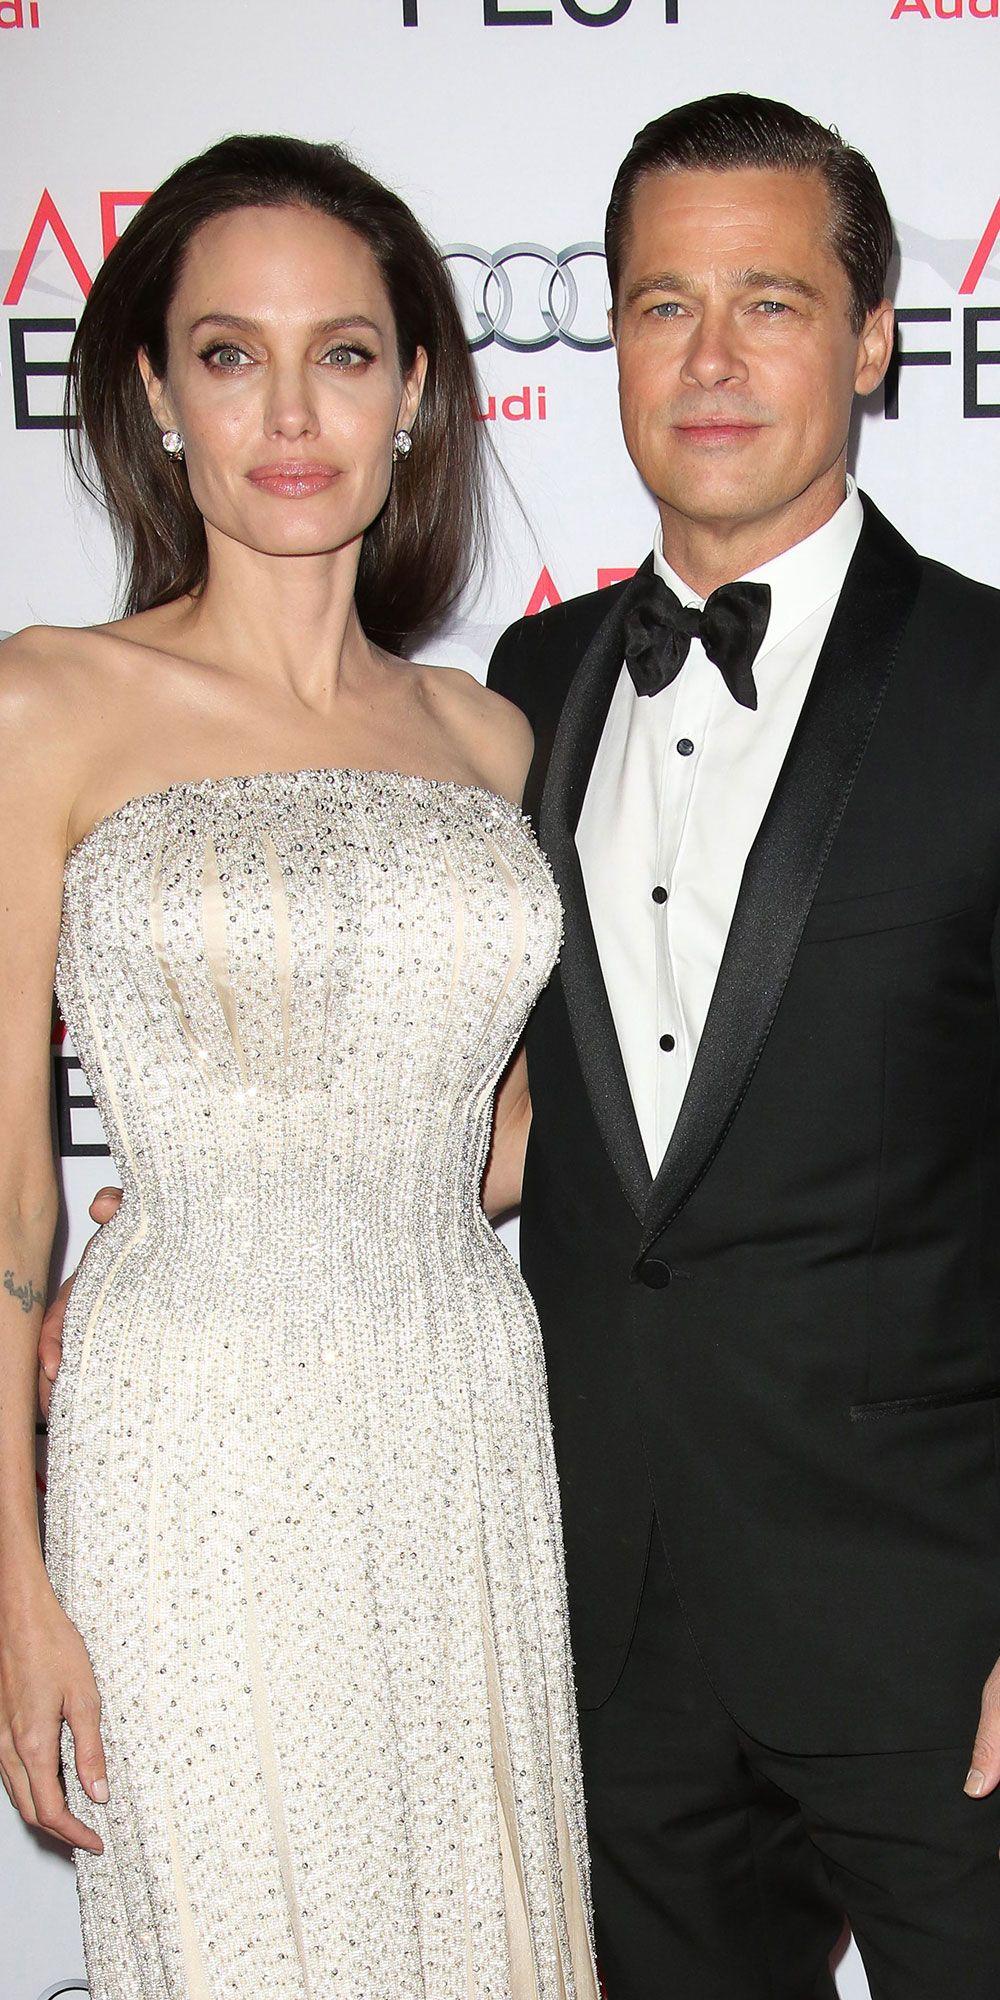 Angelina Jolie Had A Tattoo Binding Her To Brad Pitt Months Before Split Strapless Dress Formal Brad Pitt Angelina Jolie